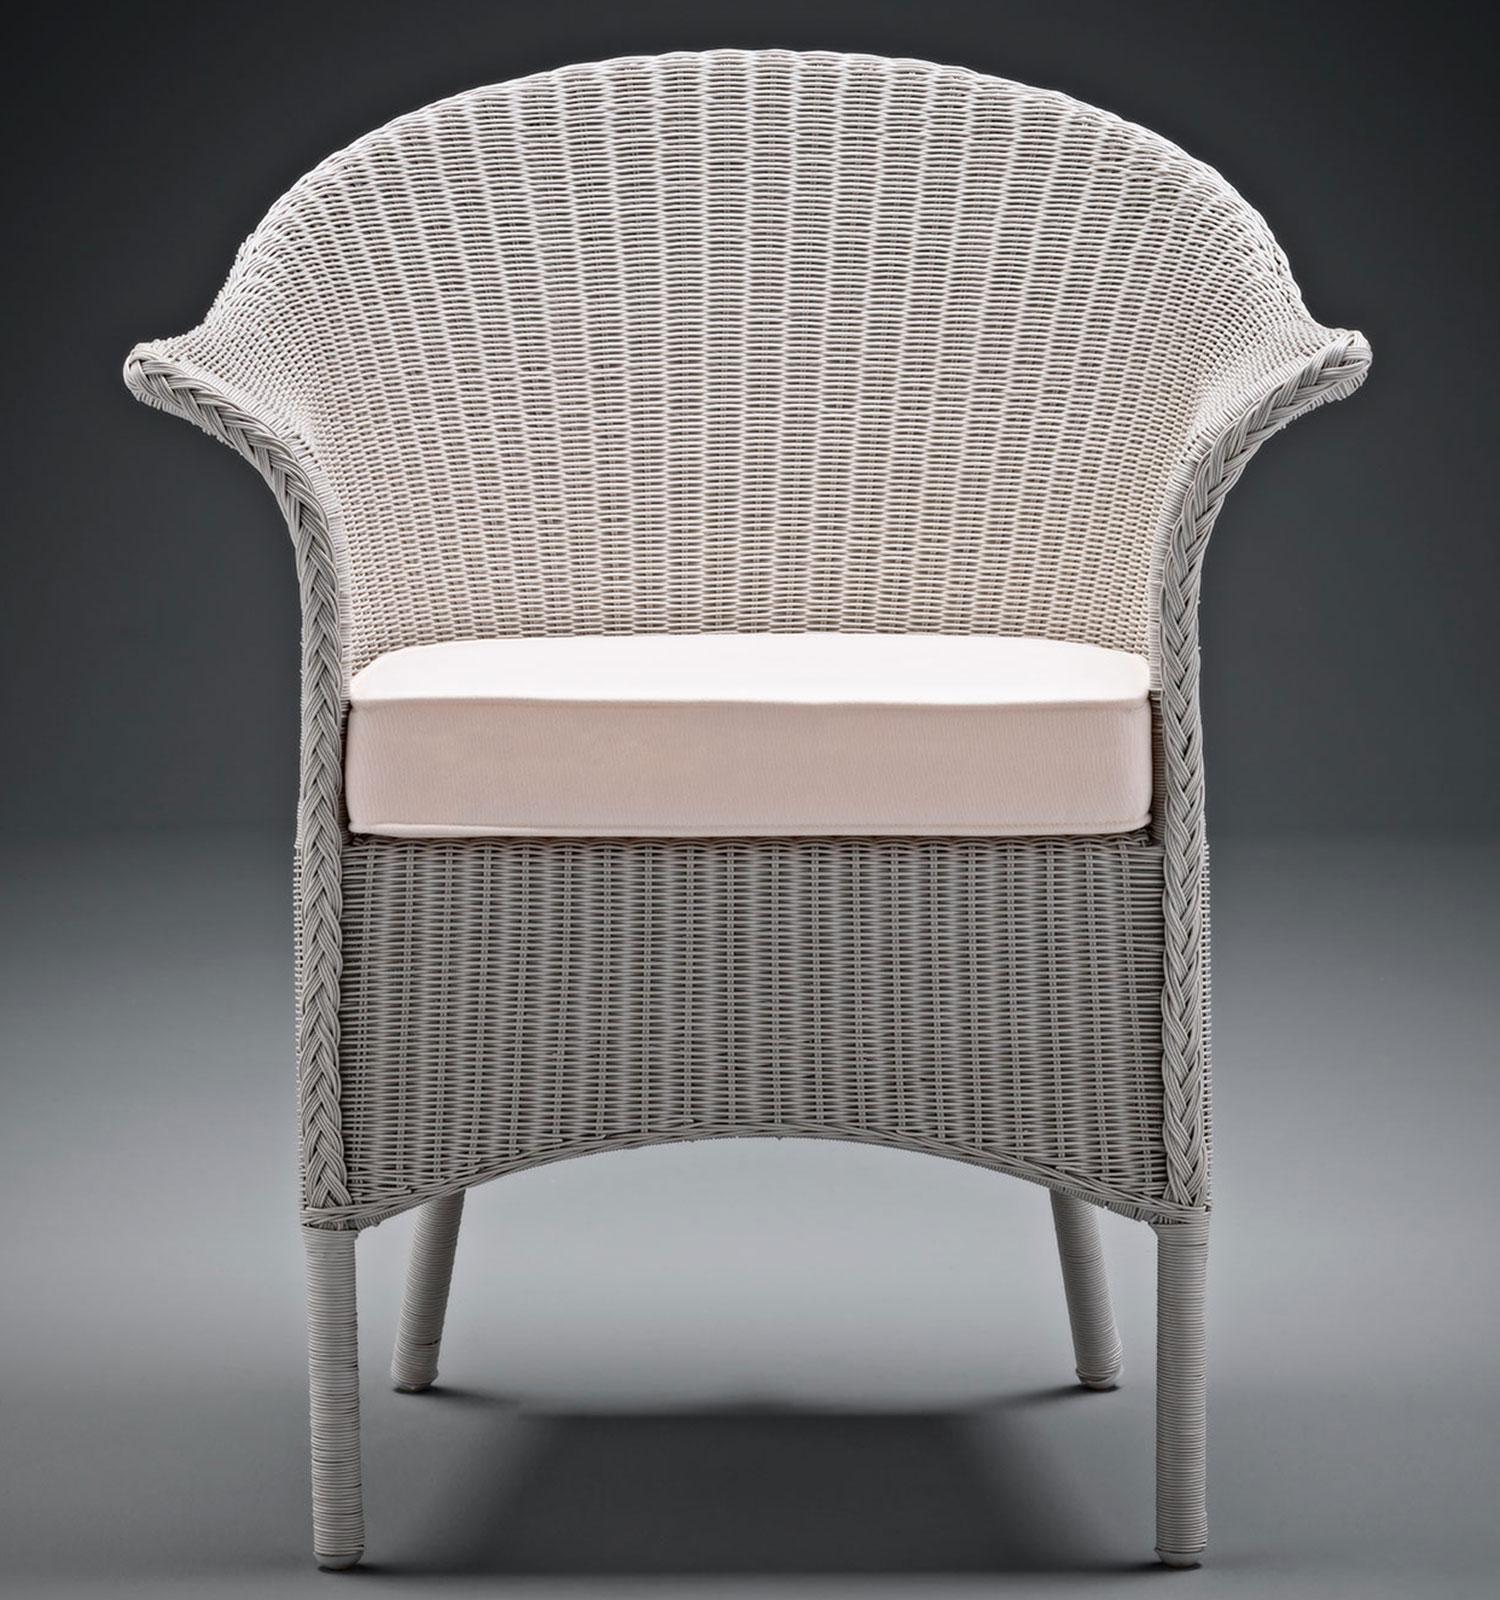 Cool The Lloyd Loom Blenheim Outdoor Chair Download Free Architecture Designs Rallybritishbridgeorg